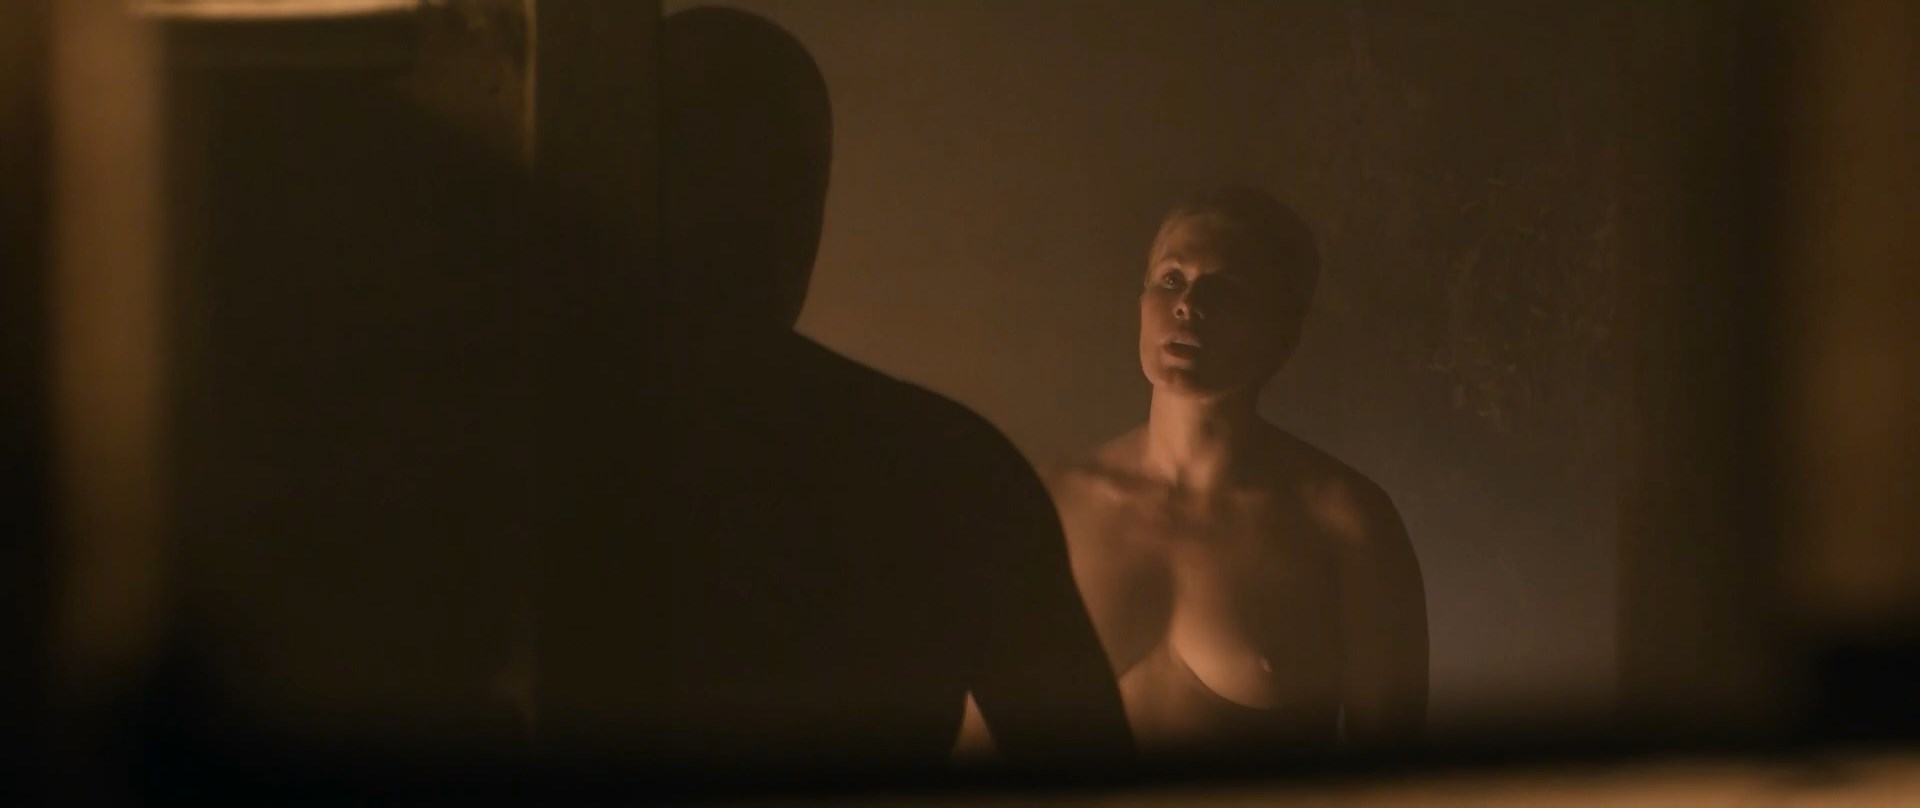 Evgeniya Gladiy nude - Zaboronenyi (2019)